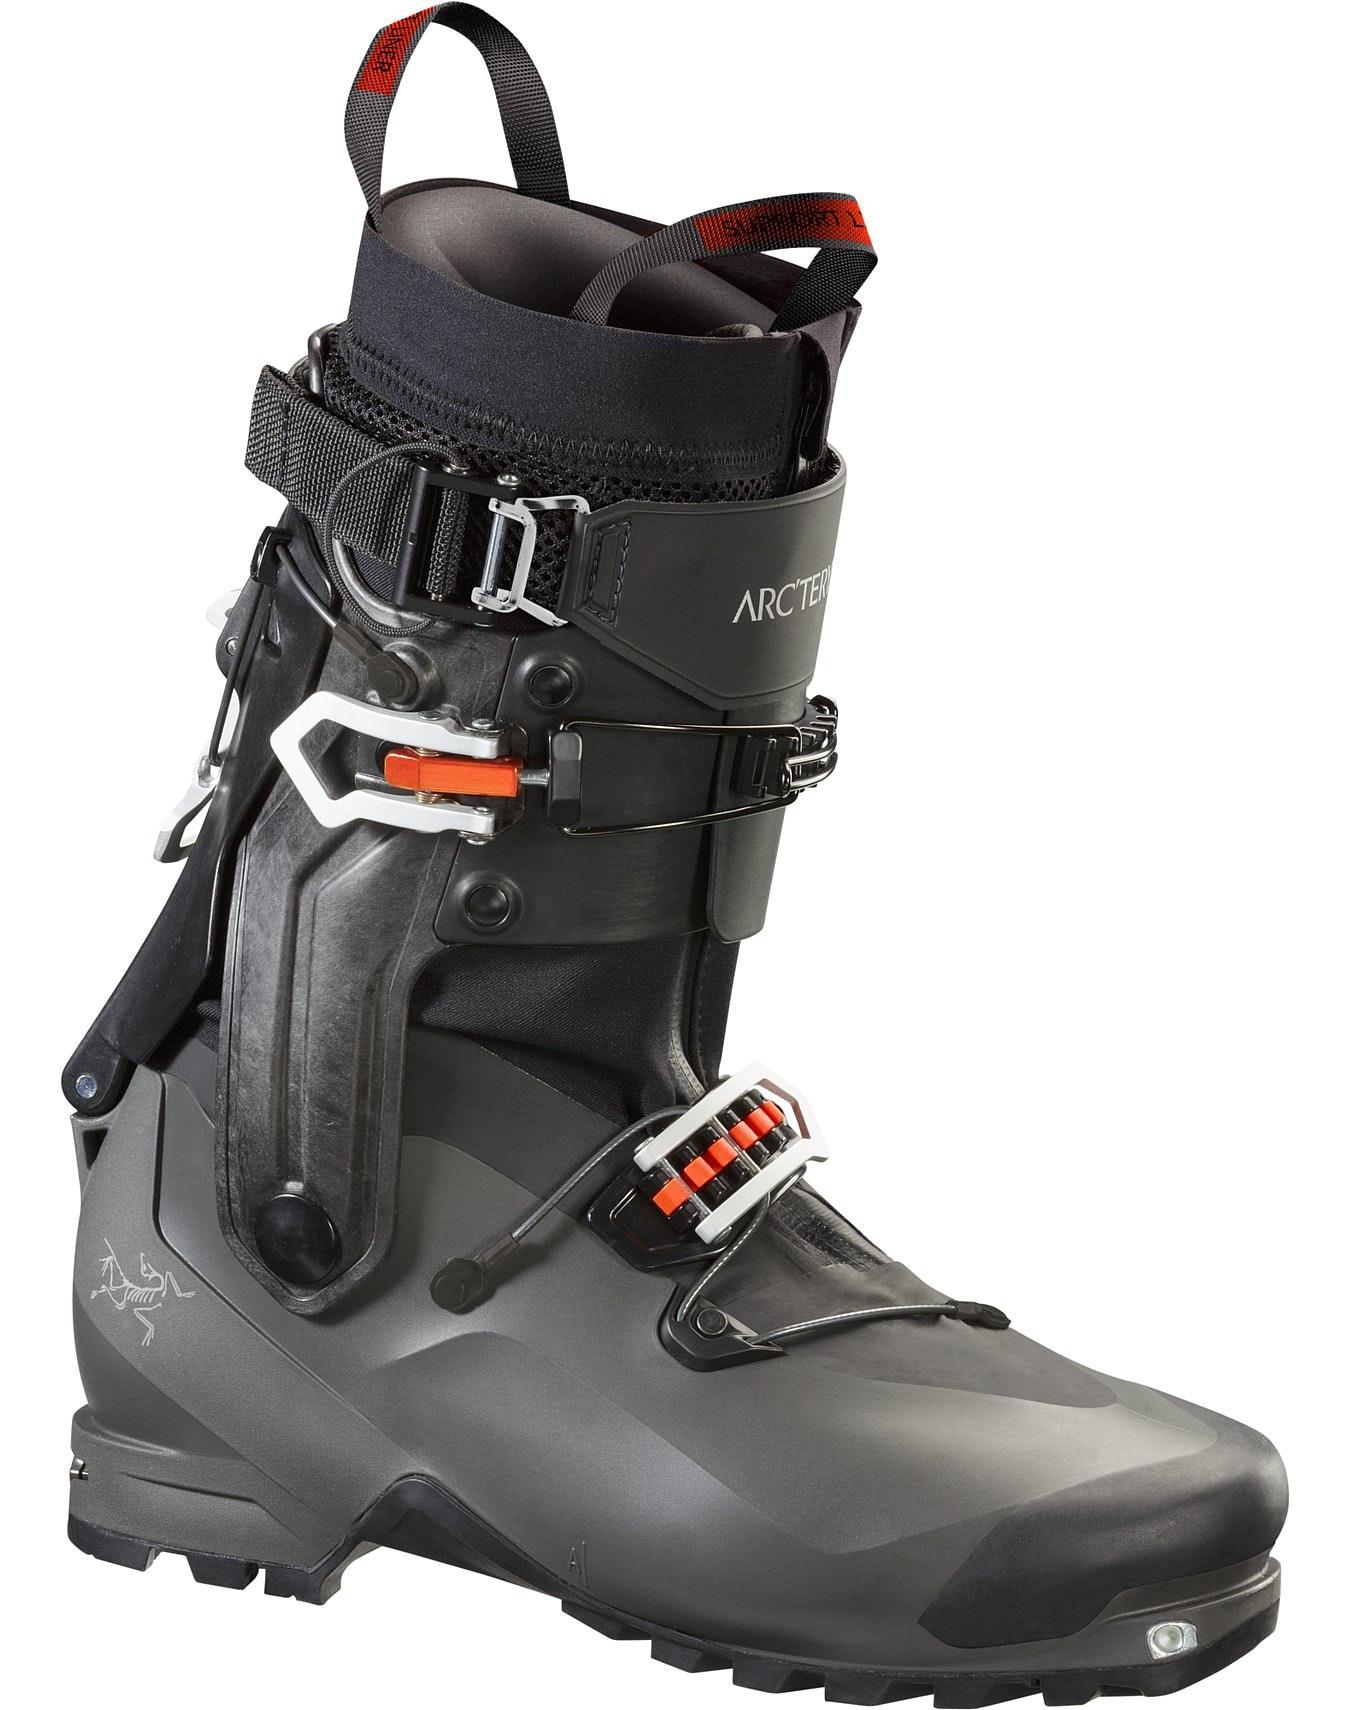 comfortable boots image mlg ten product hvl ski tecnica comforter